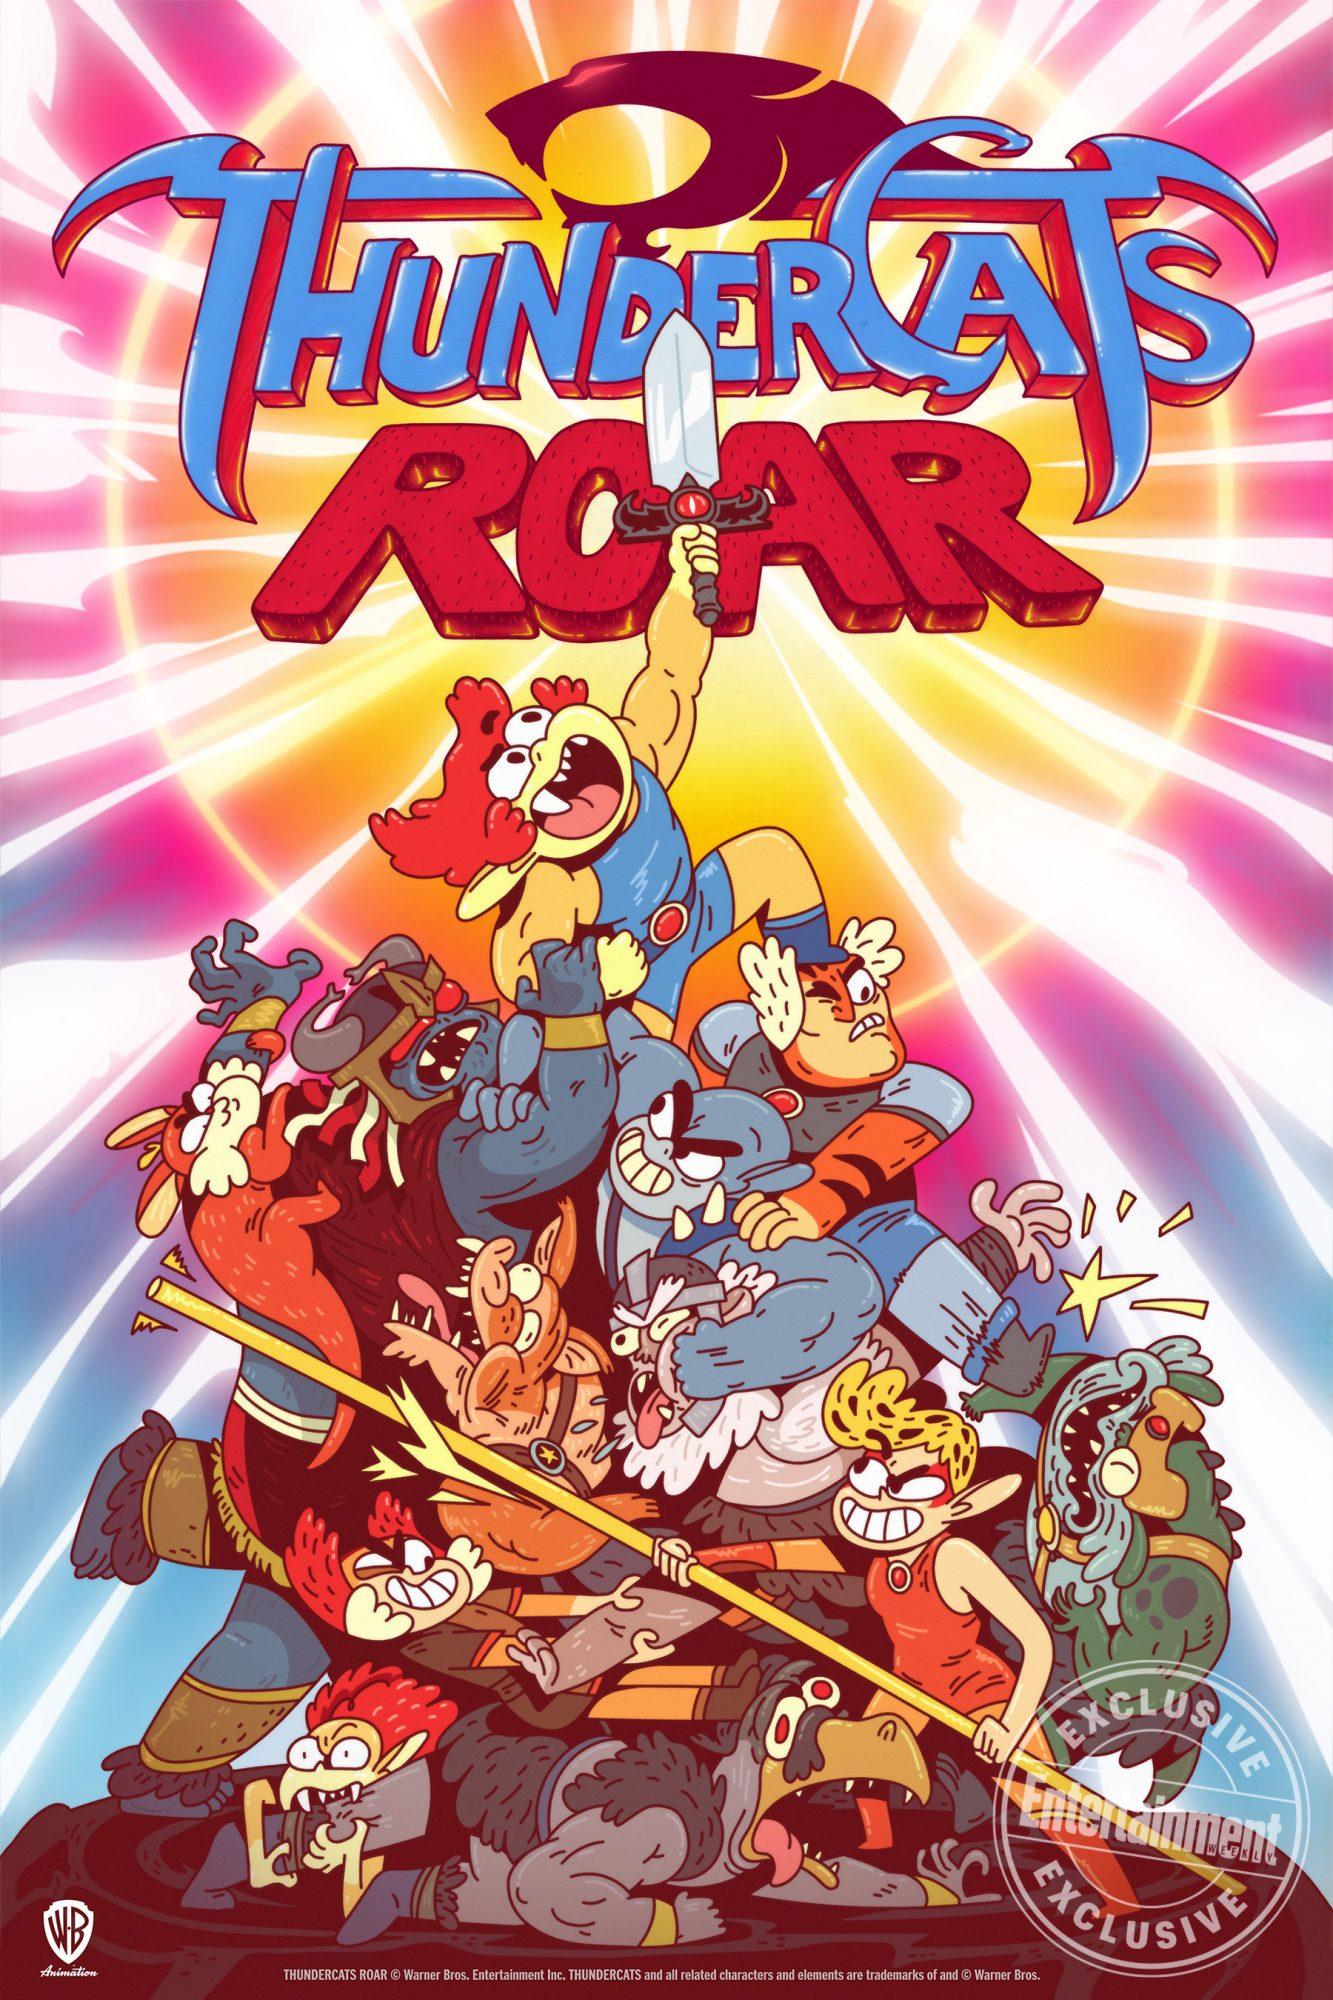 TCATS-ROAR-Series-Poster